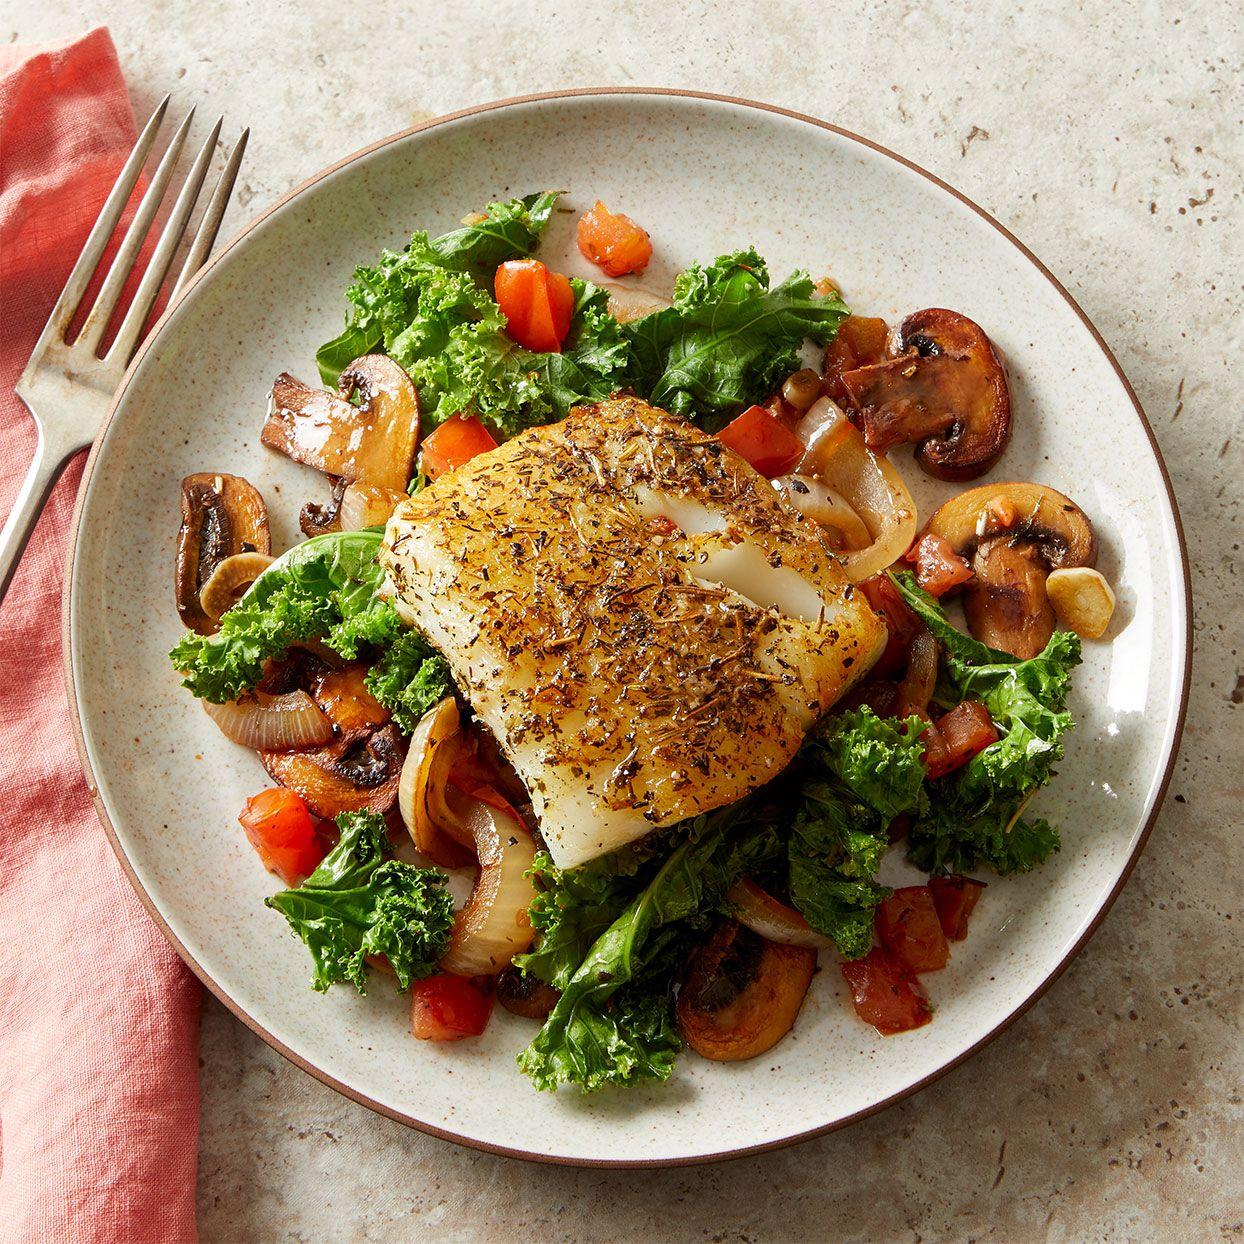 Low Carb Mediterranean Fish Dinner Healthy Dinner In 20 Minutes Recipe Fish Dinner Mediterranean Fish Recipe Easy Fish Recipes